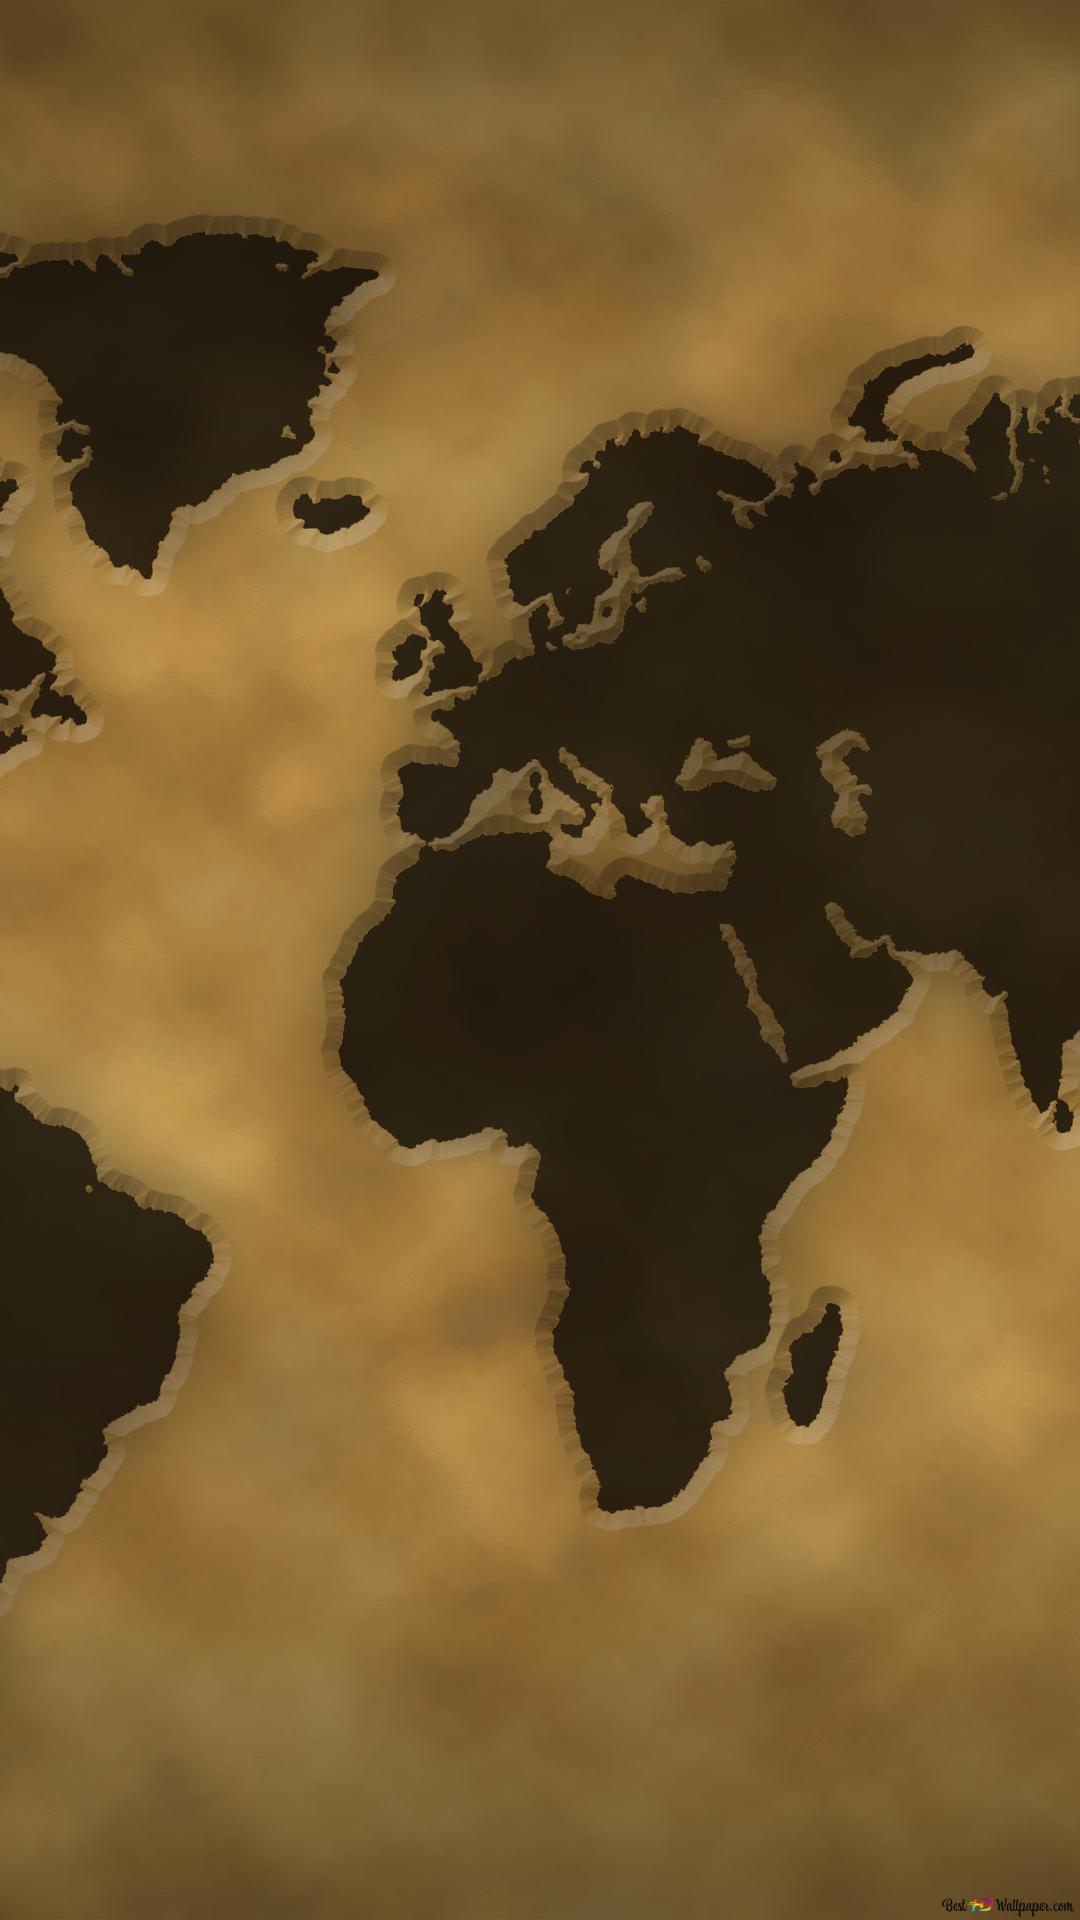 Vintage World Map HD Wallpaper